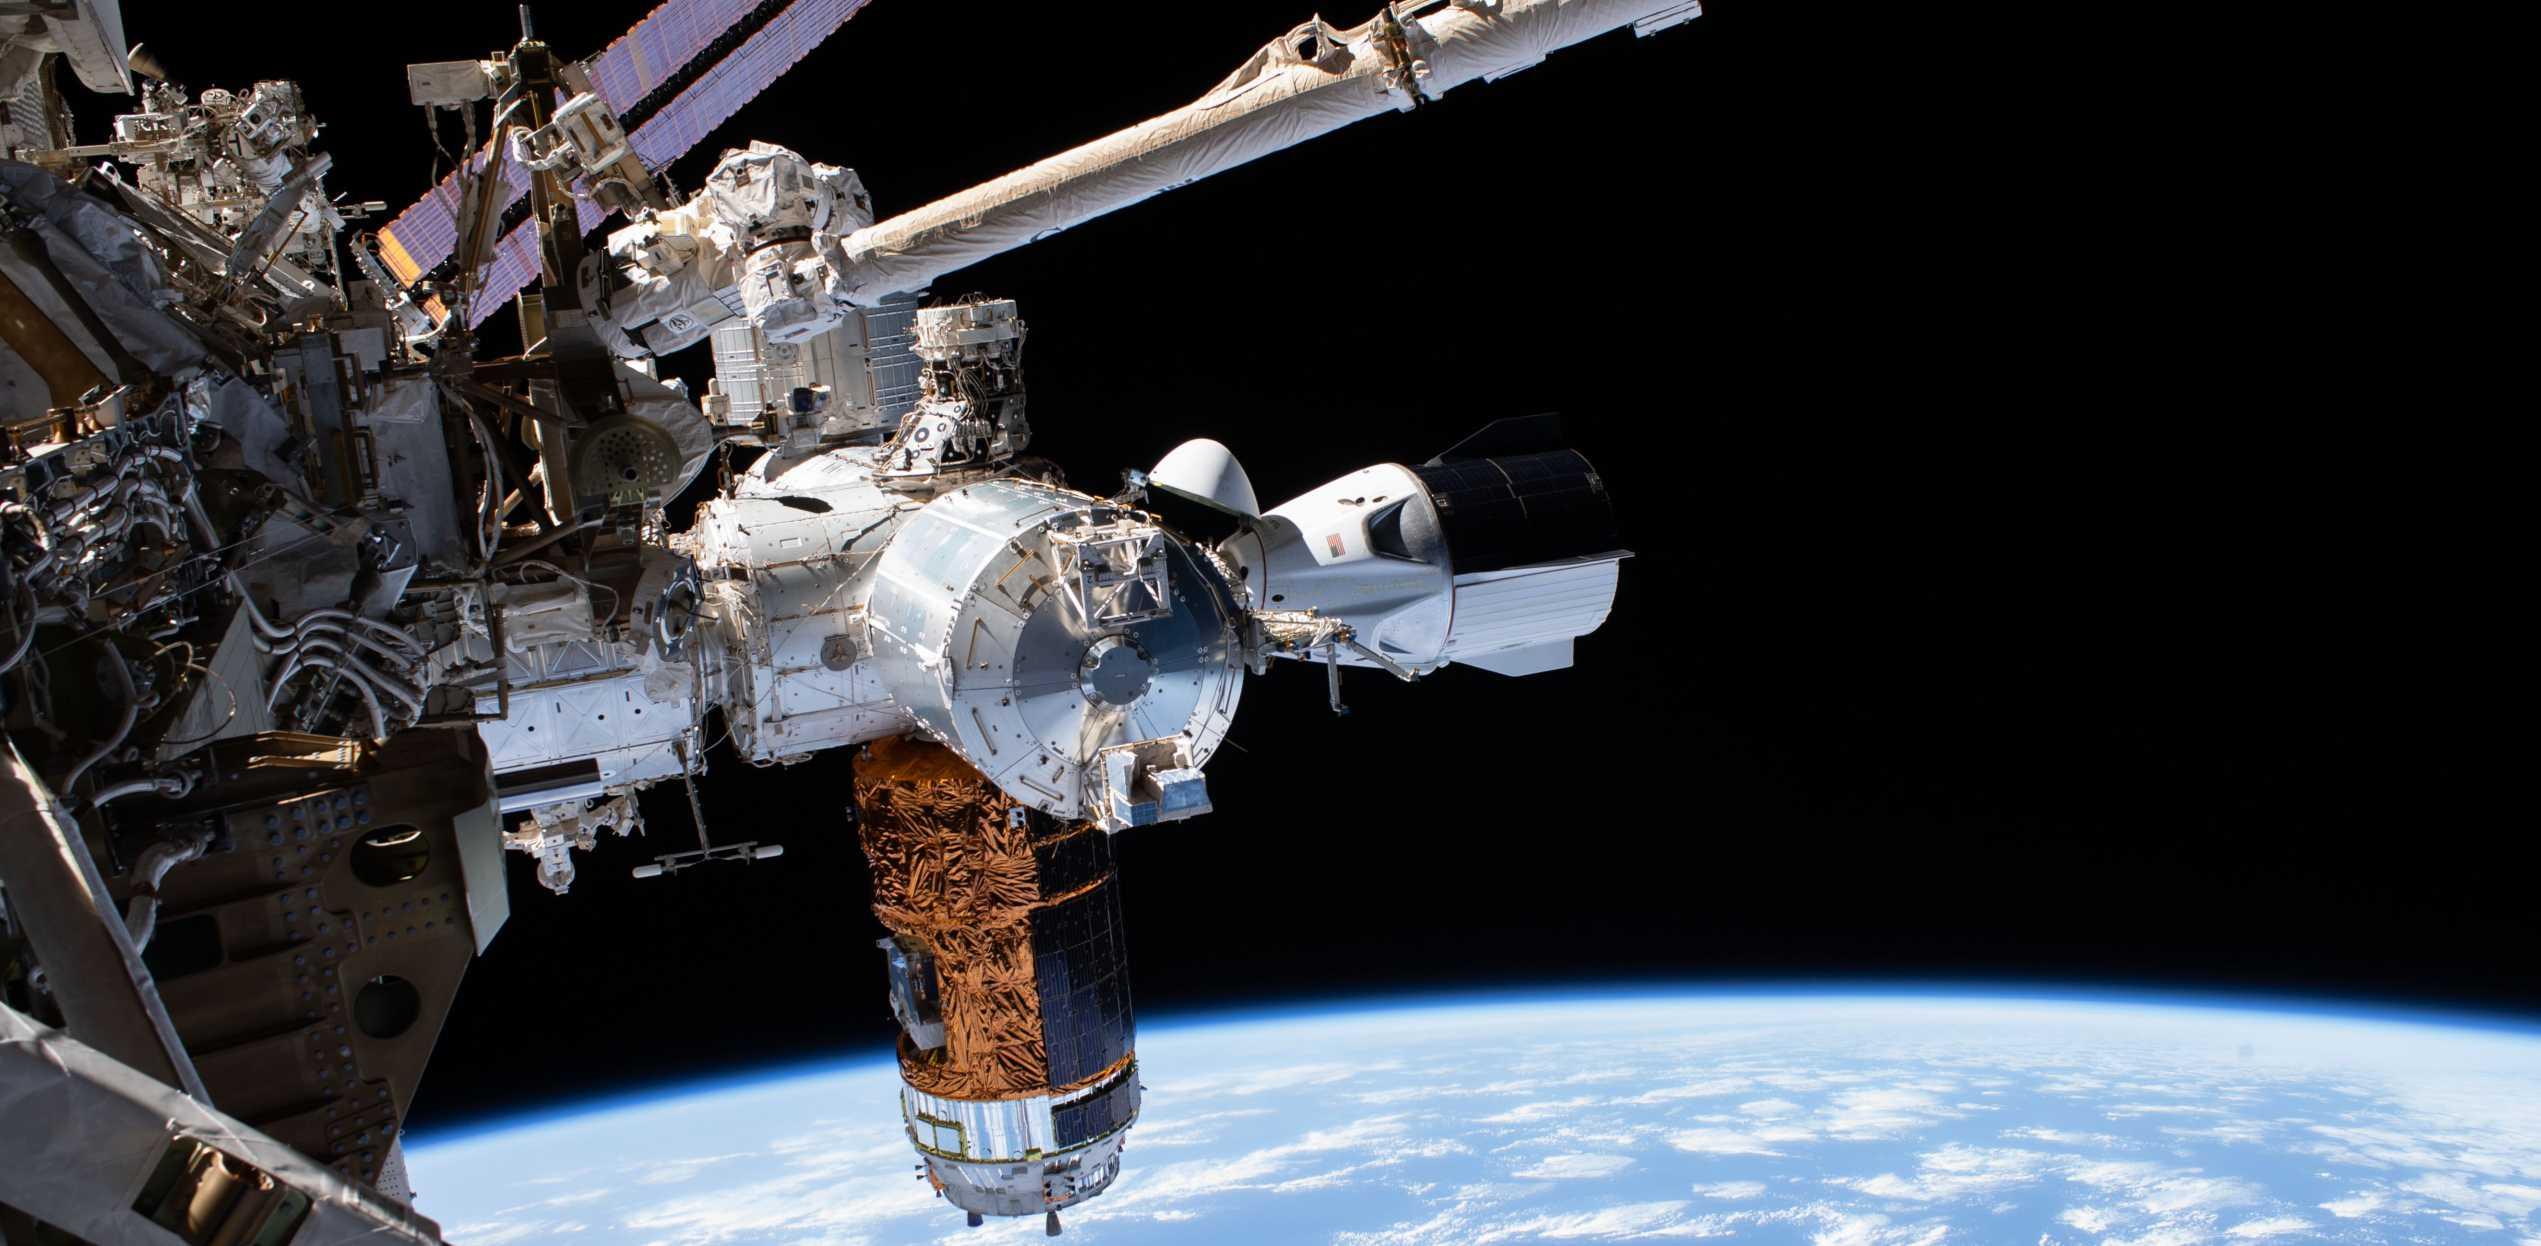 SpaceX Crew Dragon C206 Demo-2 ISS spacewalk 070120 (NASA) 1 crop 2 (c)